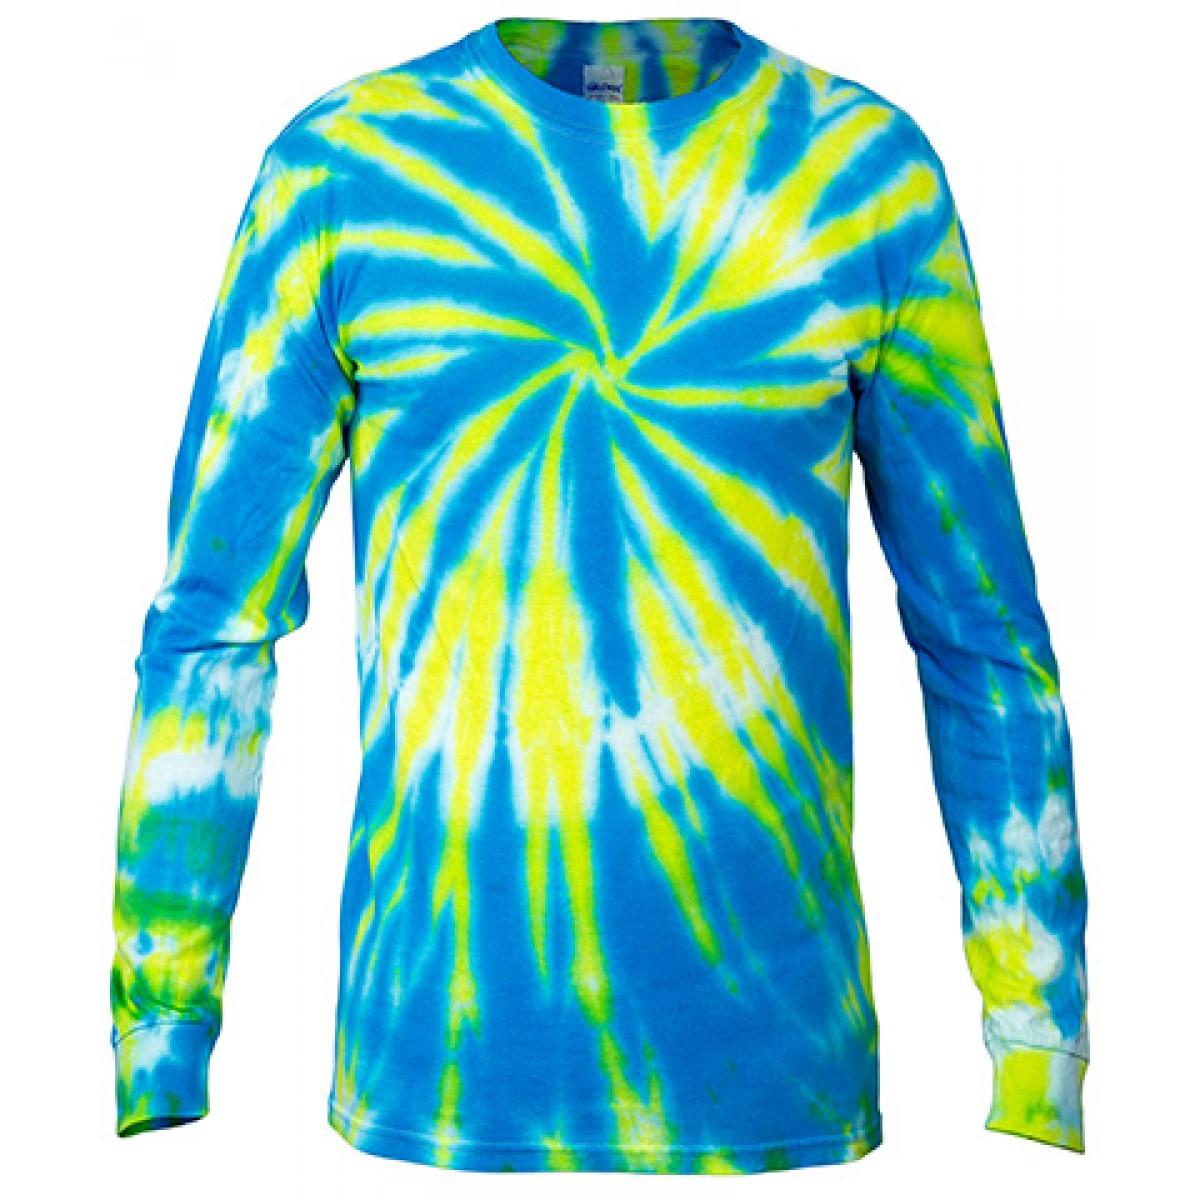 Multi Color Tie-Dye Long Sleeve Shirt -Blue-L